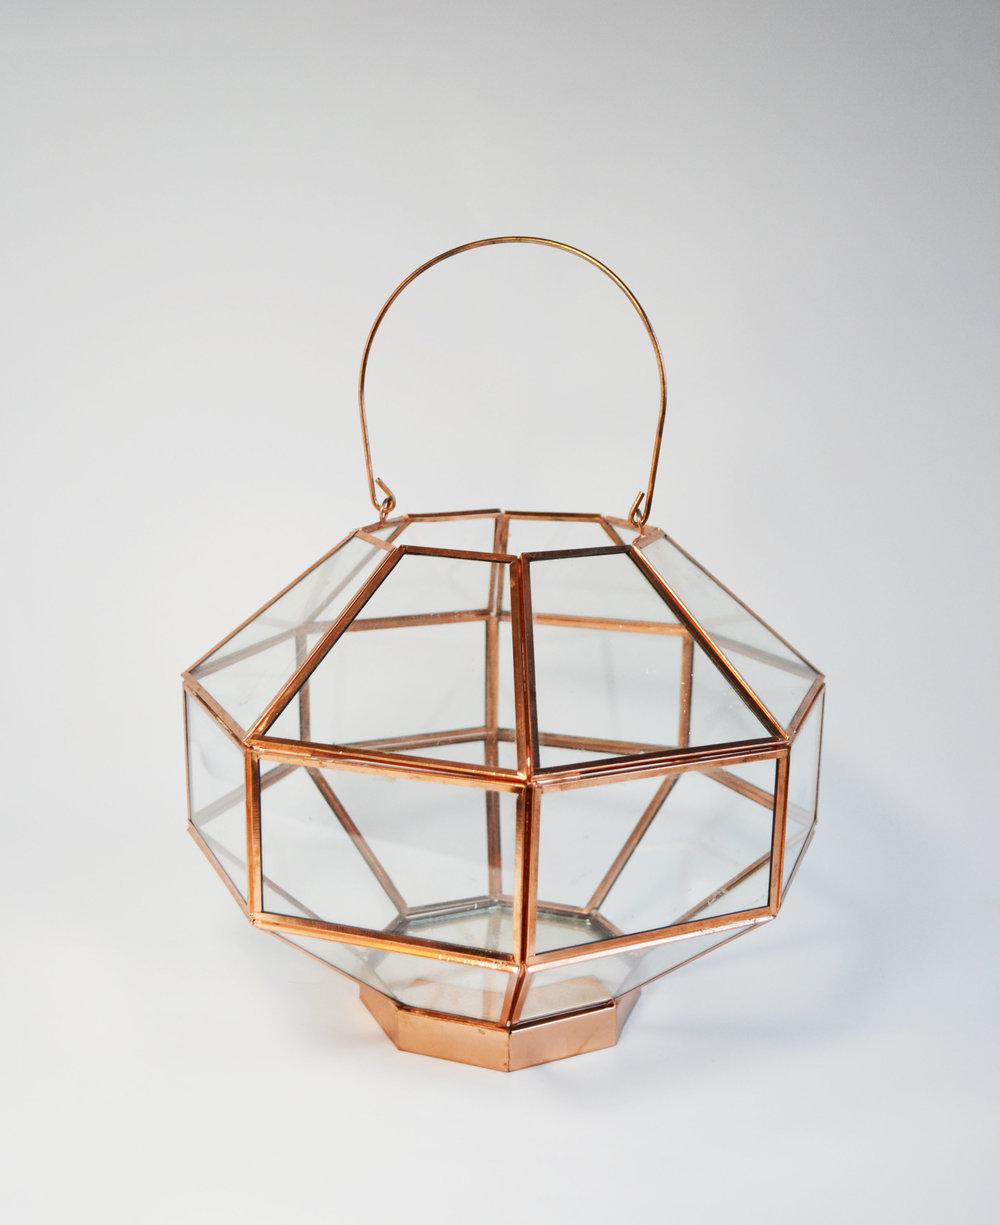 geo lantern -   rose gold   Quantity: 2  Price: $10.00